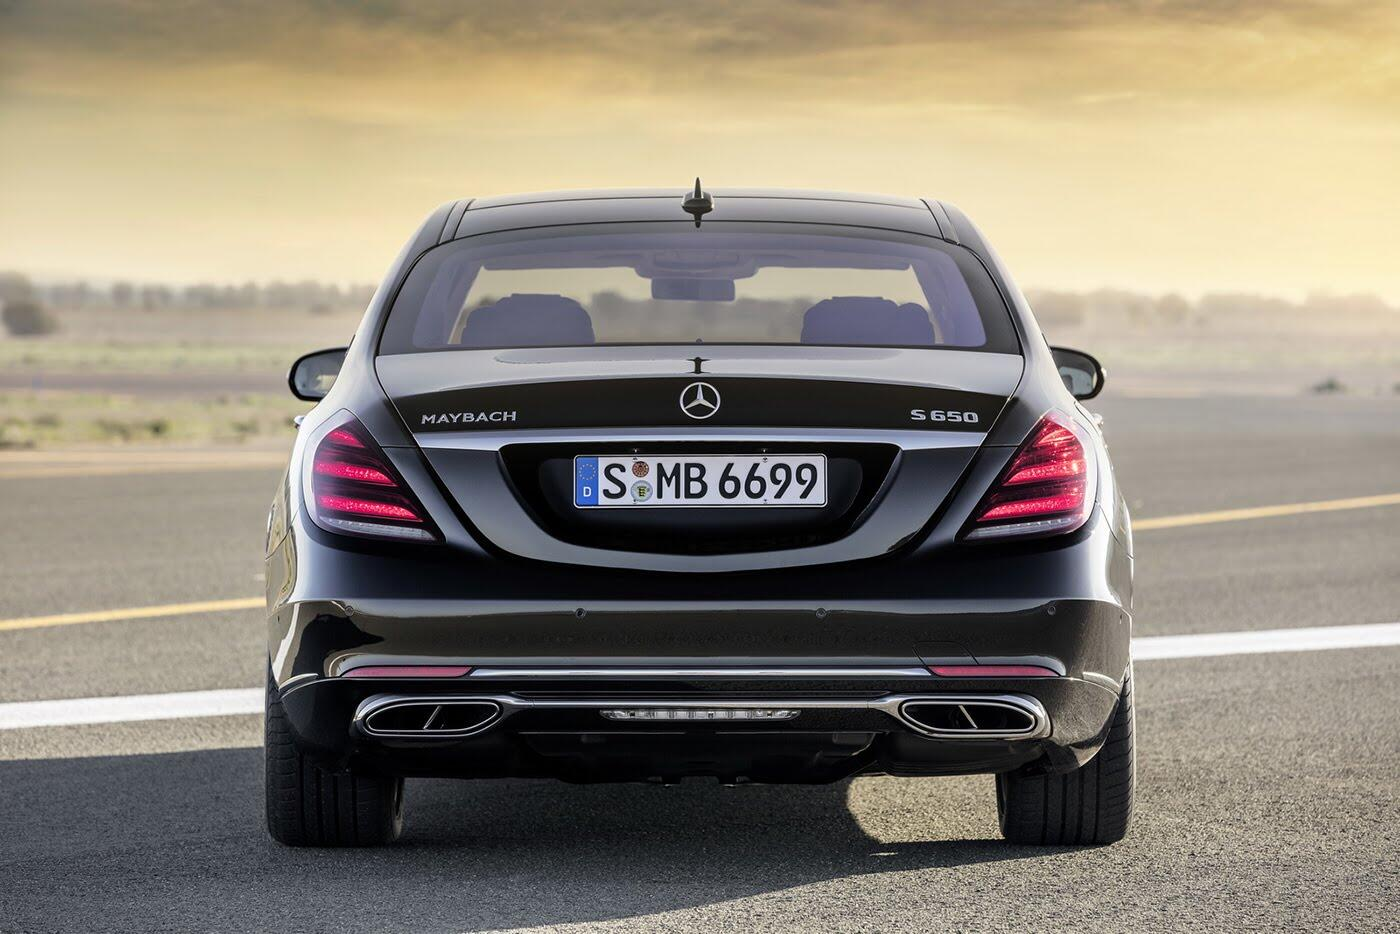 Ảnh chi tiết Mercedes-Benz S-Class 2018 - Hình 10